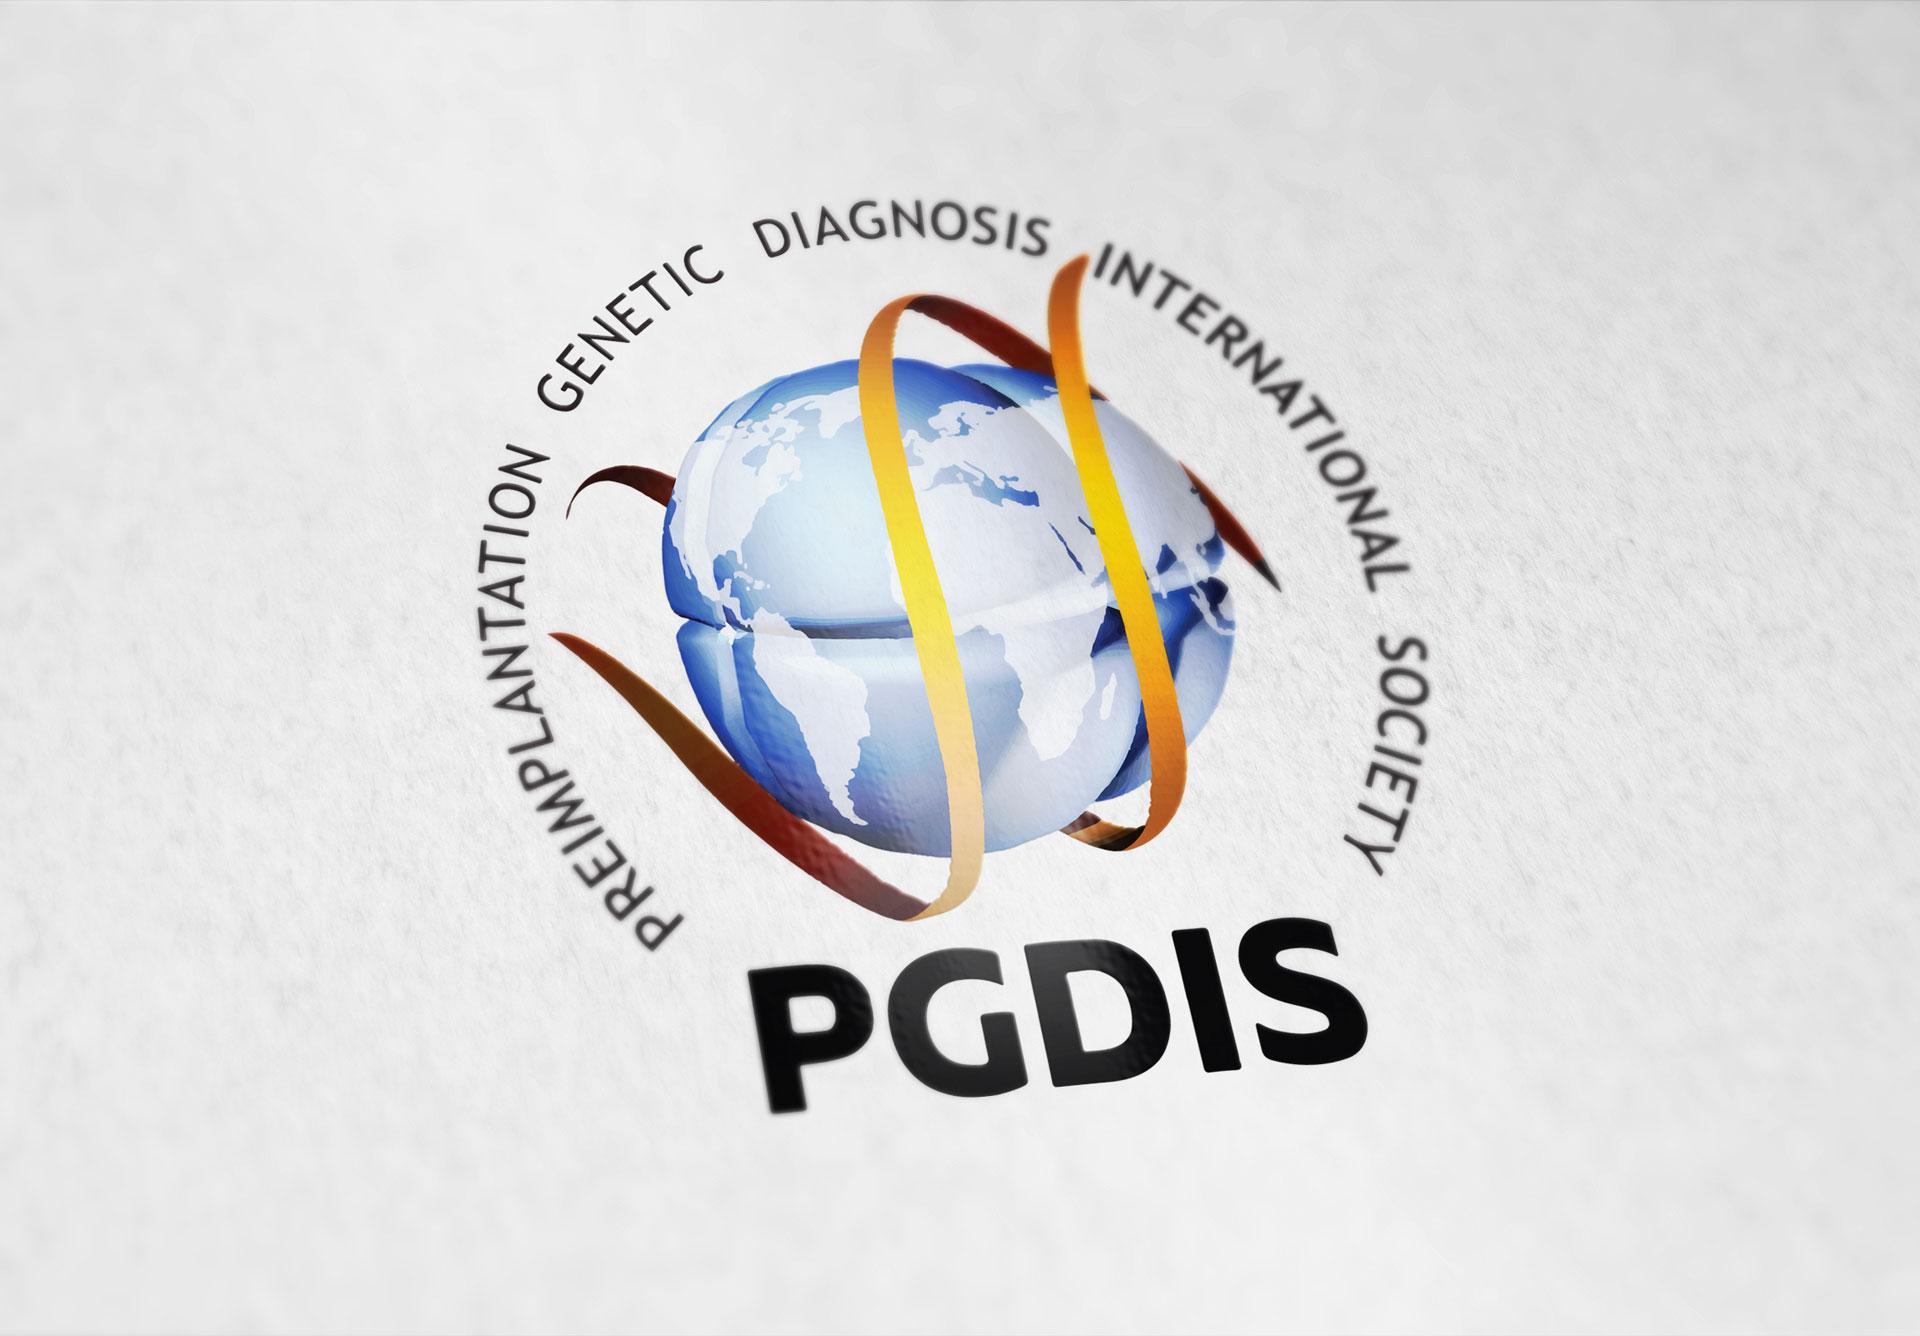 pgdis-logo-brand-isentity-revolando-04